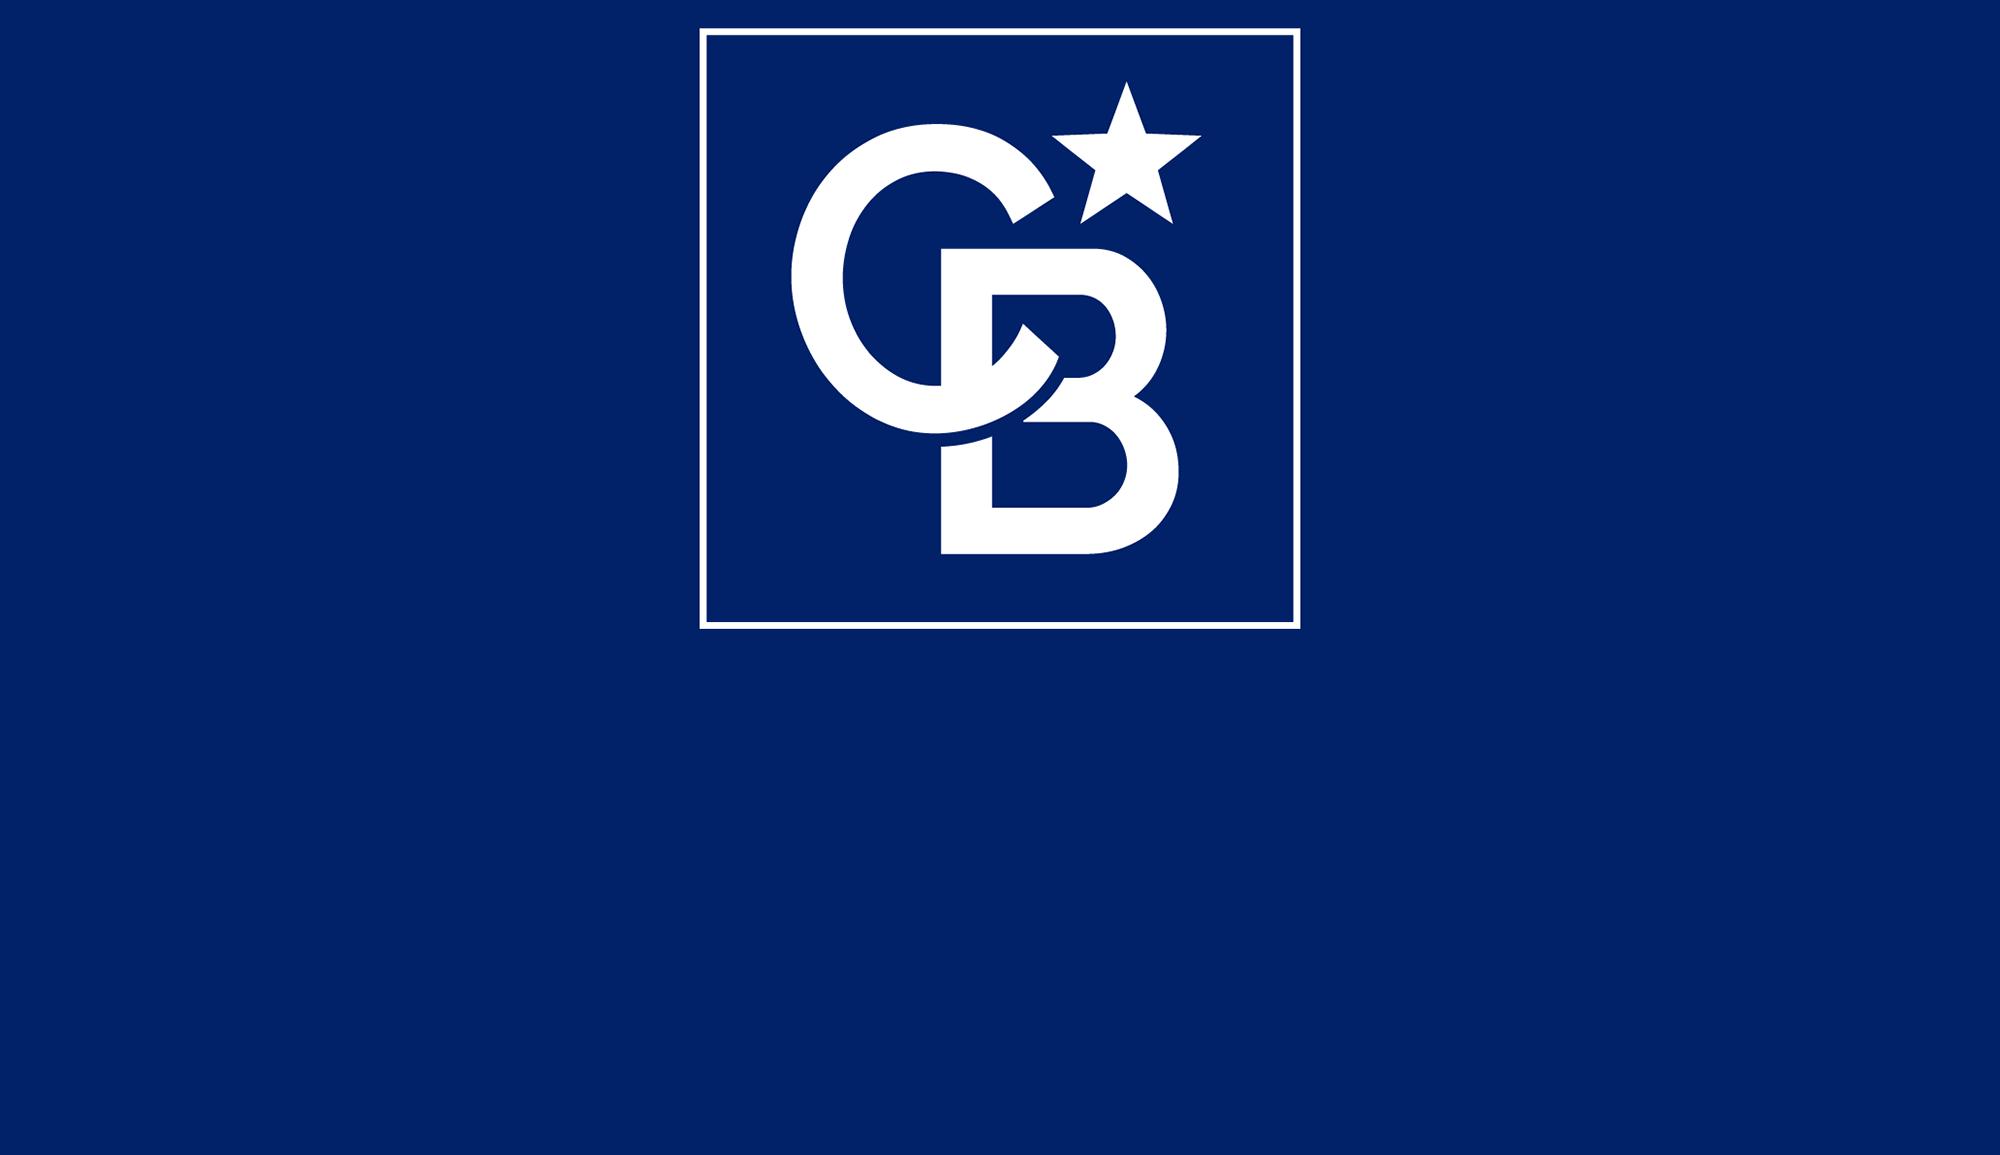 cbwm07 Logo